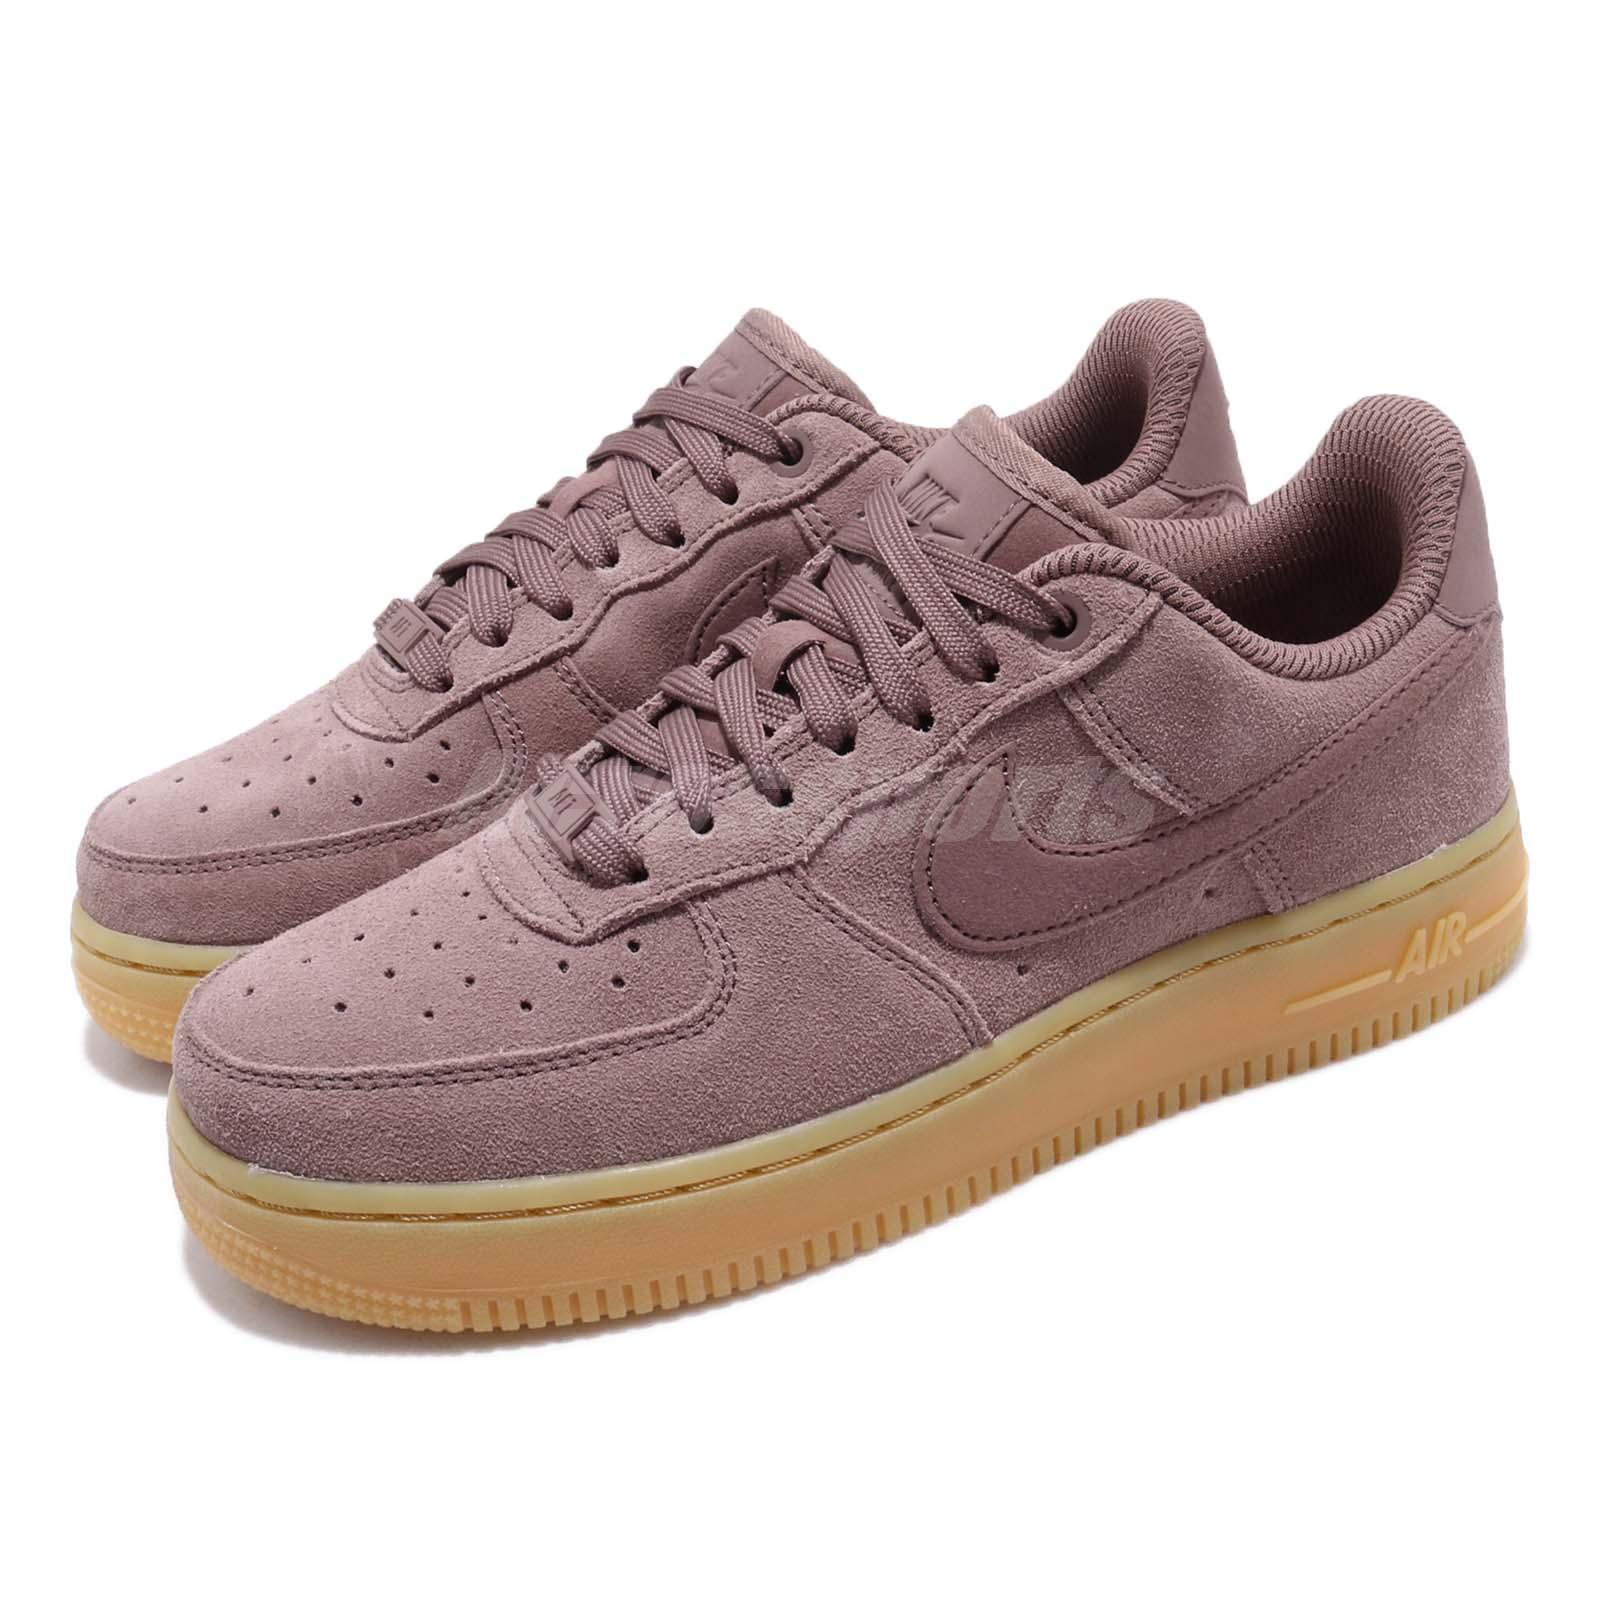 nike air force 1 07 trainers smokey mauve gum